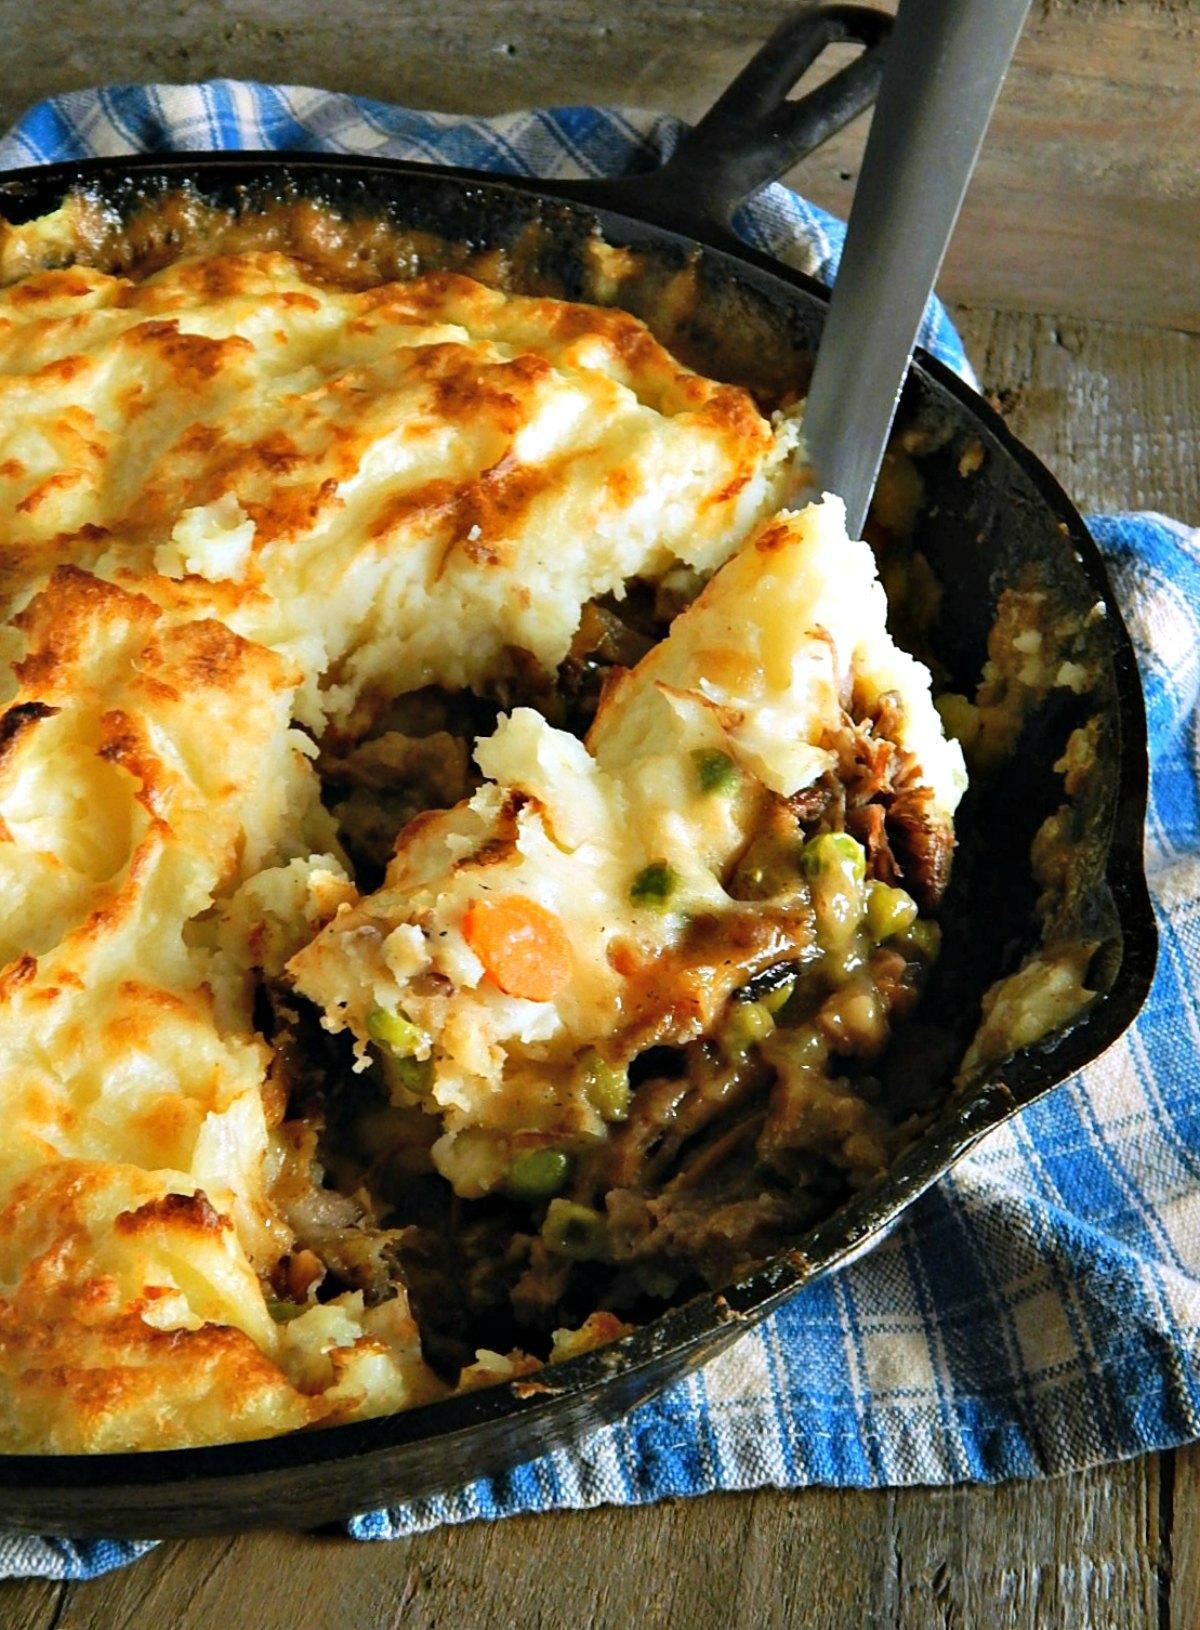 Shepherds Pie from Leftover Pot Roast